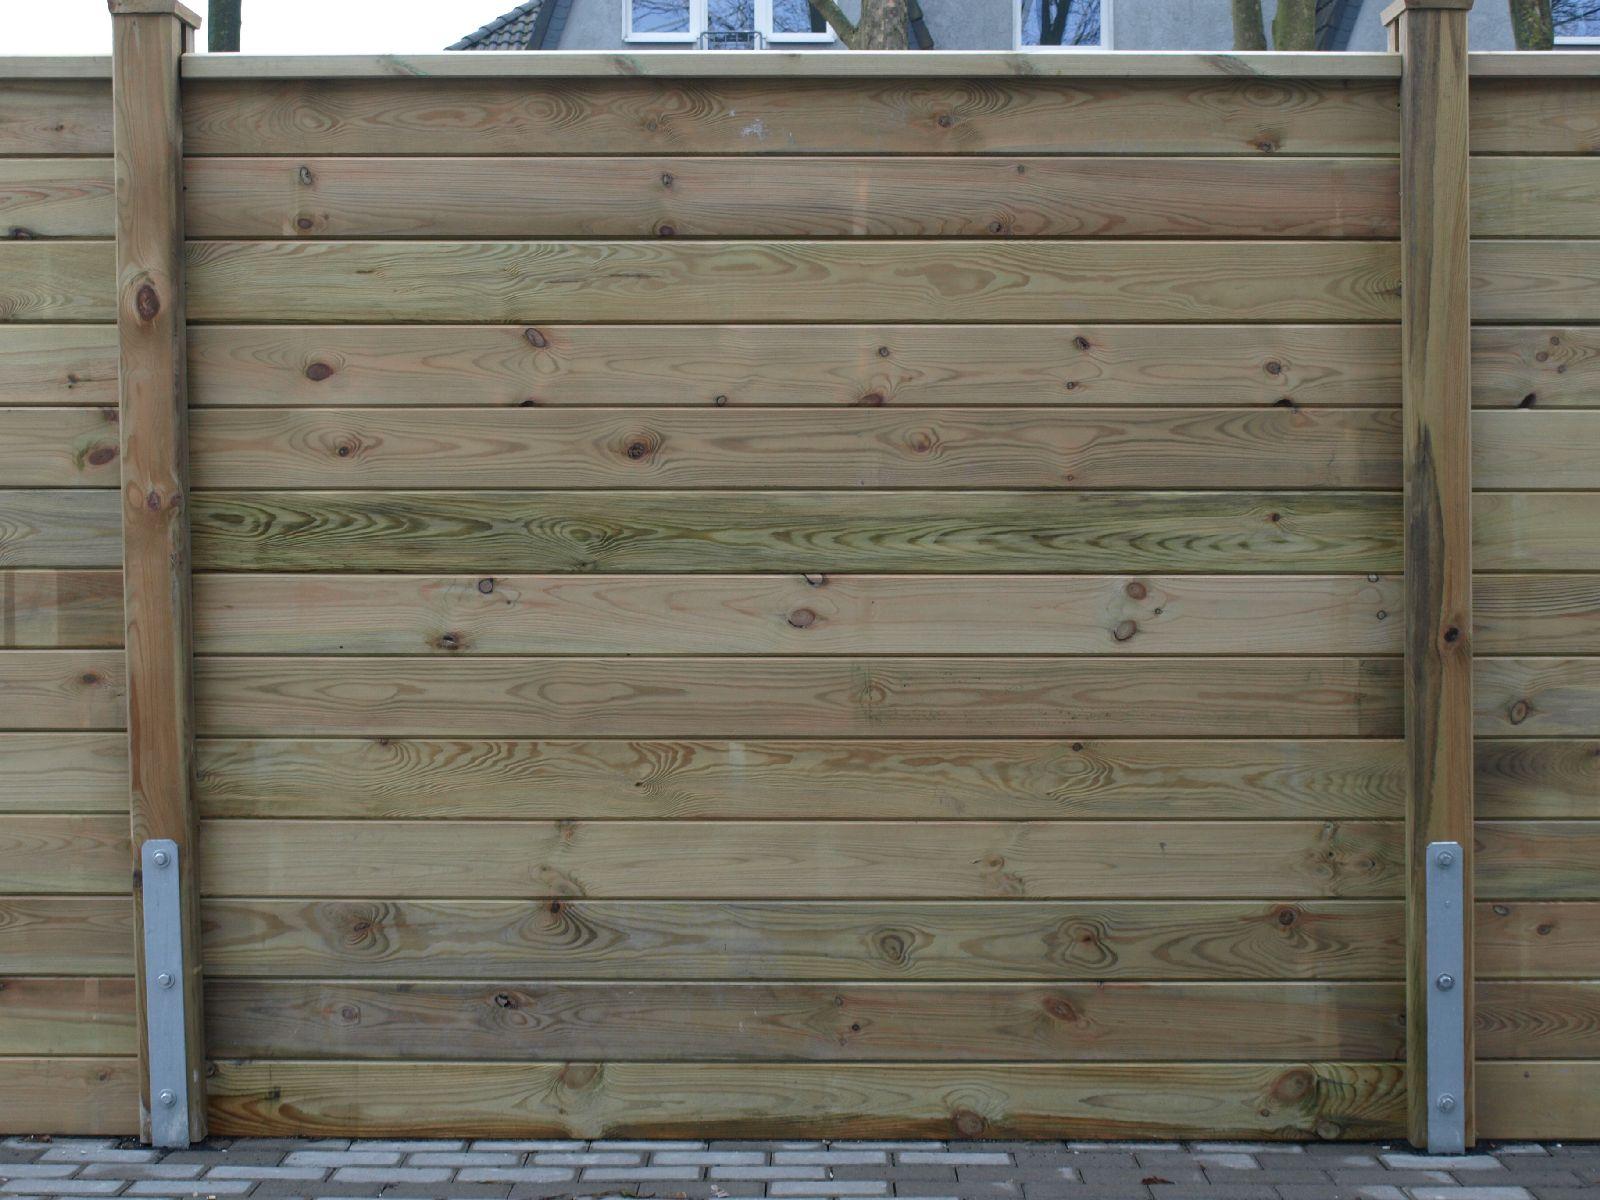 Wood_Texture_A_P2080529